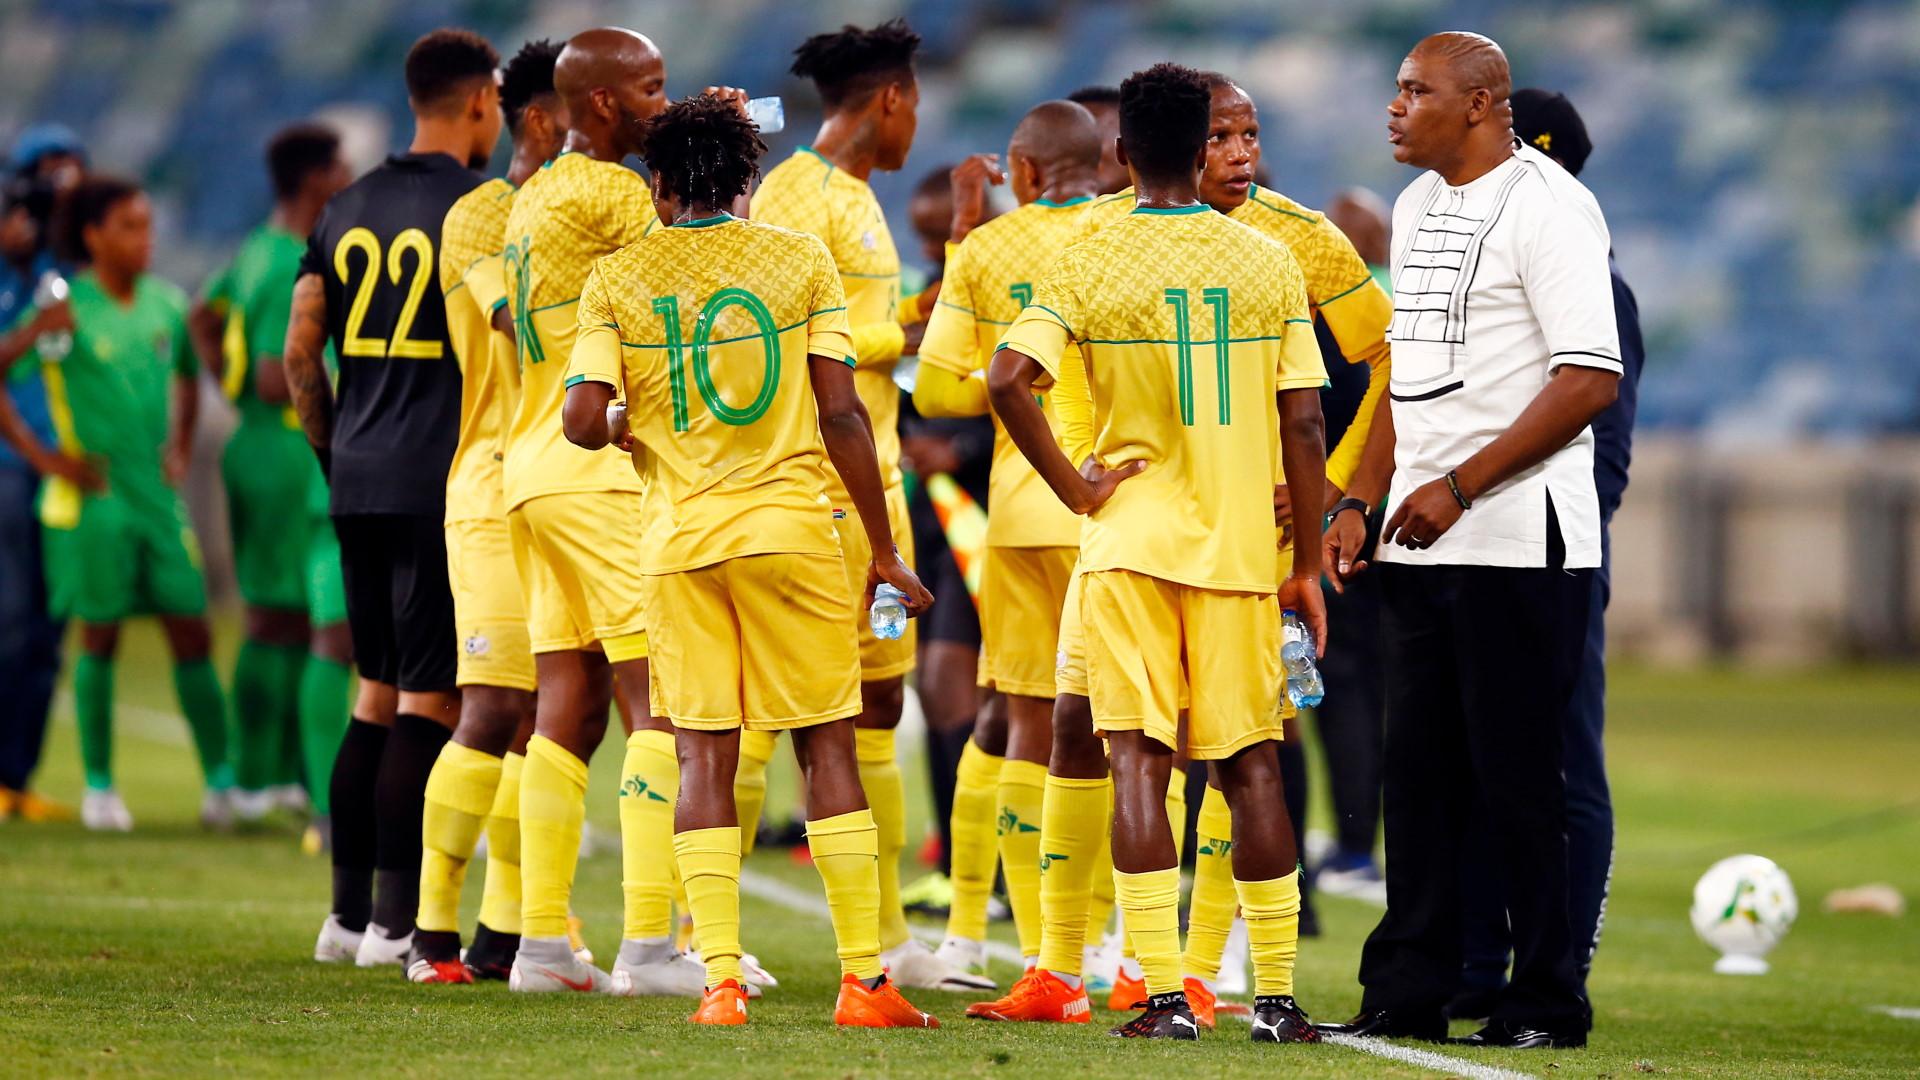 Bafana Bafana play host to Ghana at the FNB stadium on Thursday evening